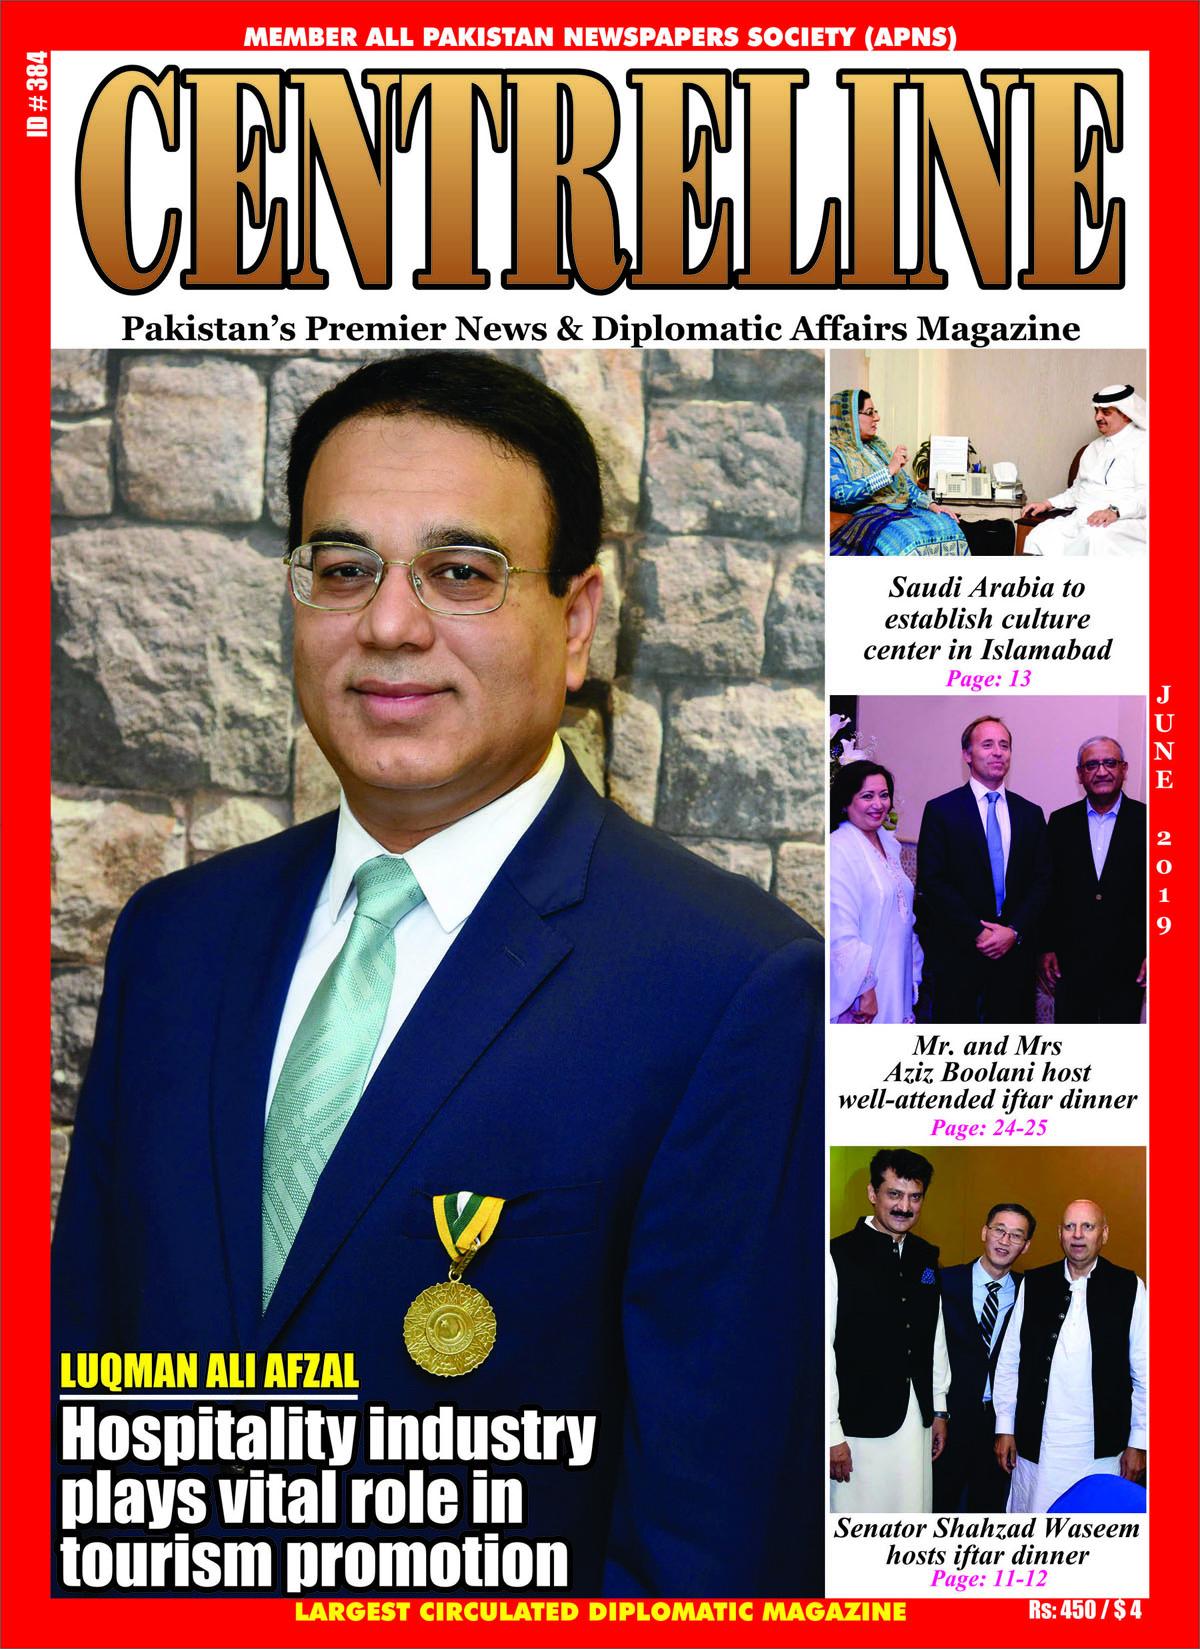 LUQMAN ALI AFZAL Hospitality industry vital role in tourism